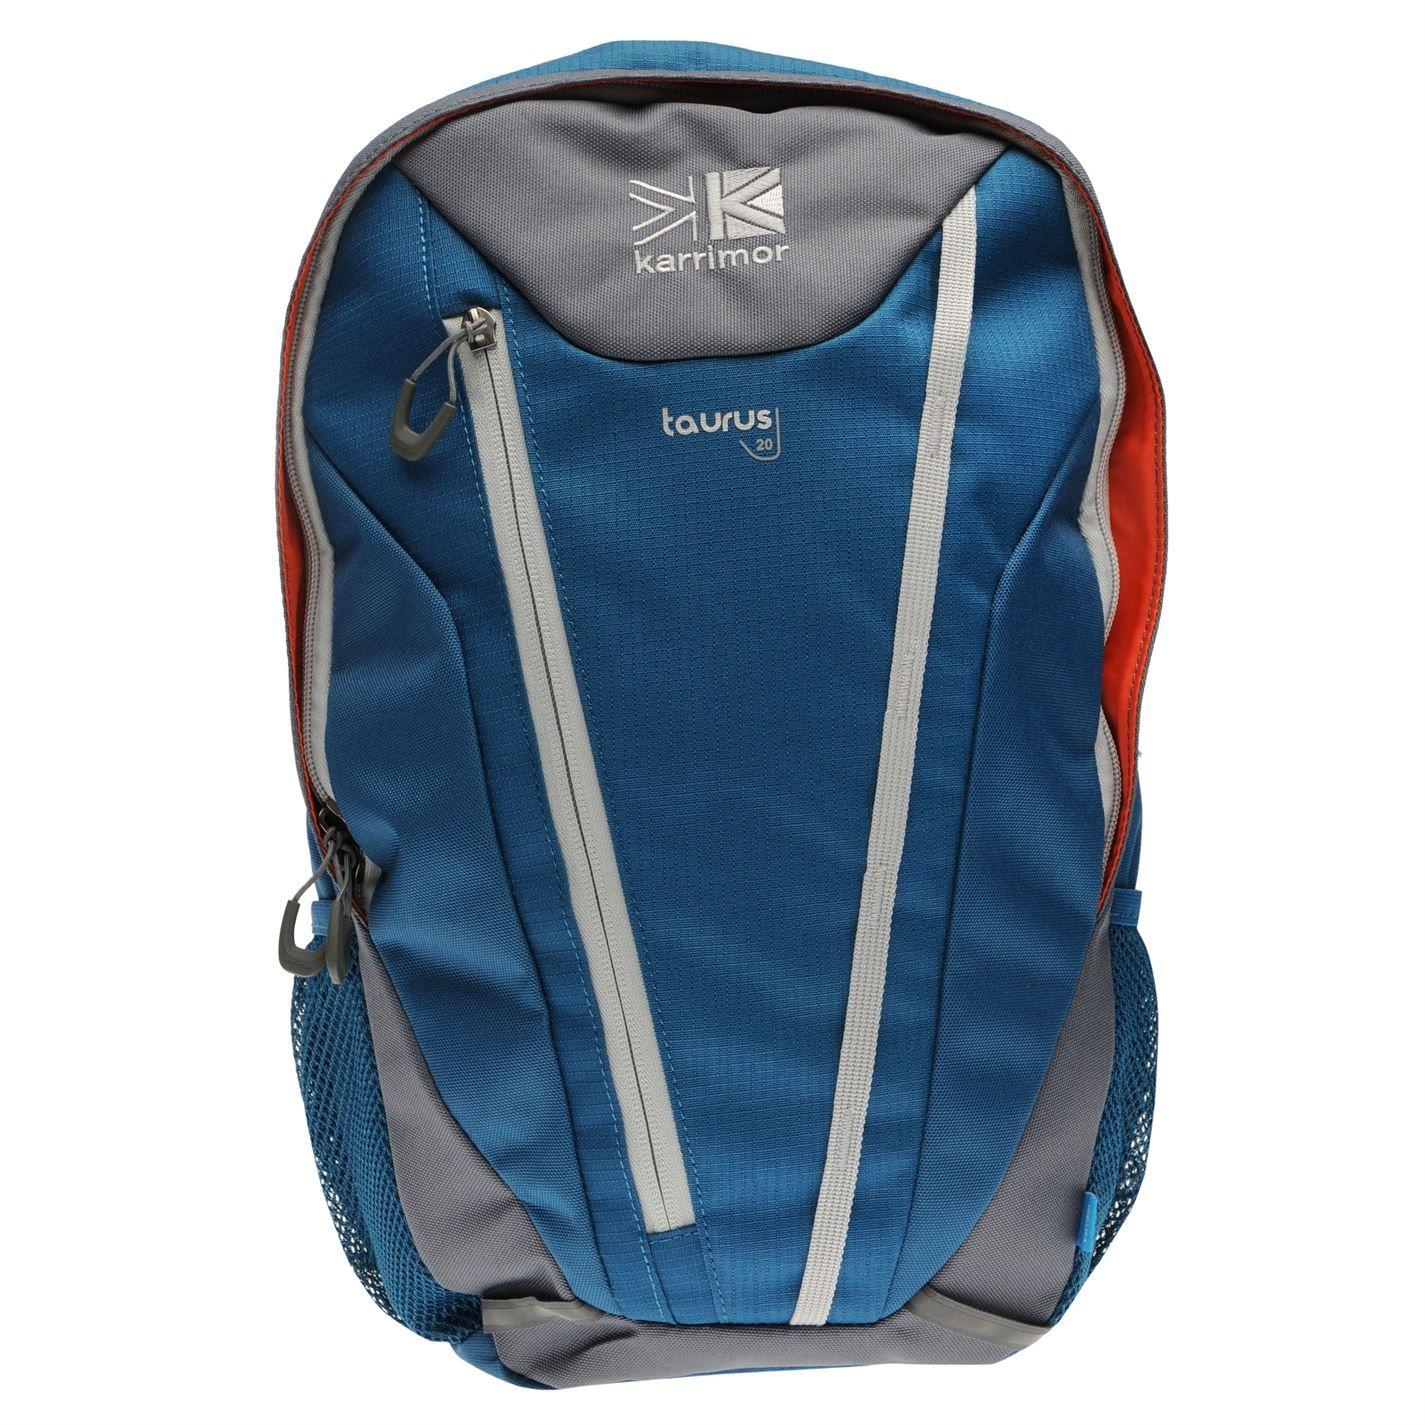 Karrimor Taurus 20 Rucksack Back Pack Travel Luggage Everyday Casual Bag